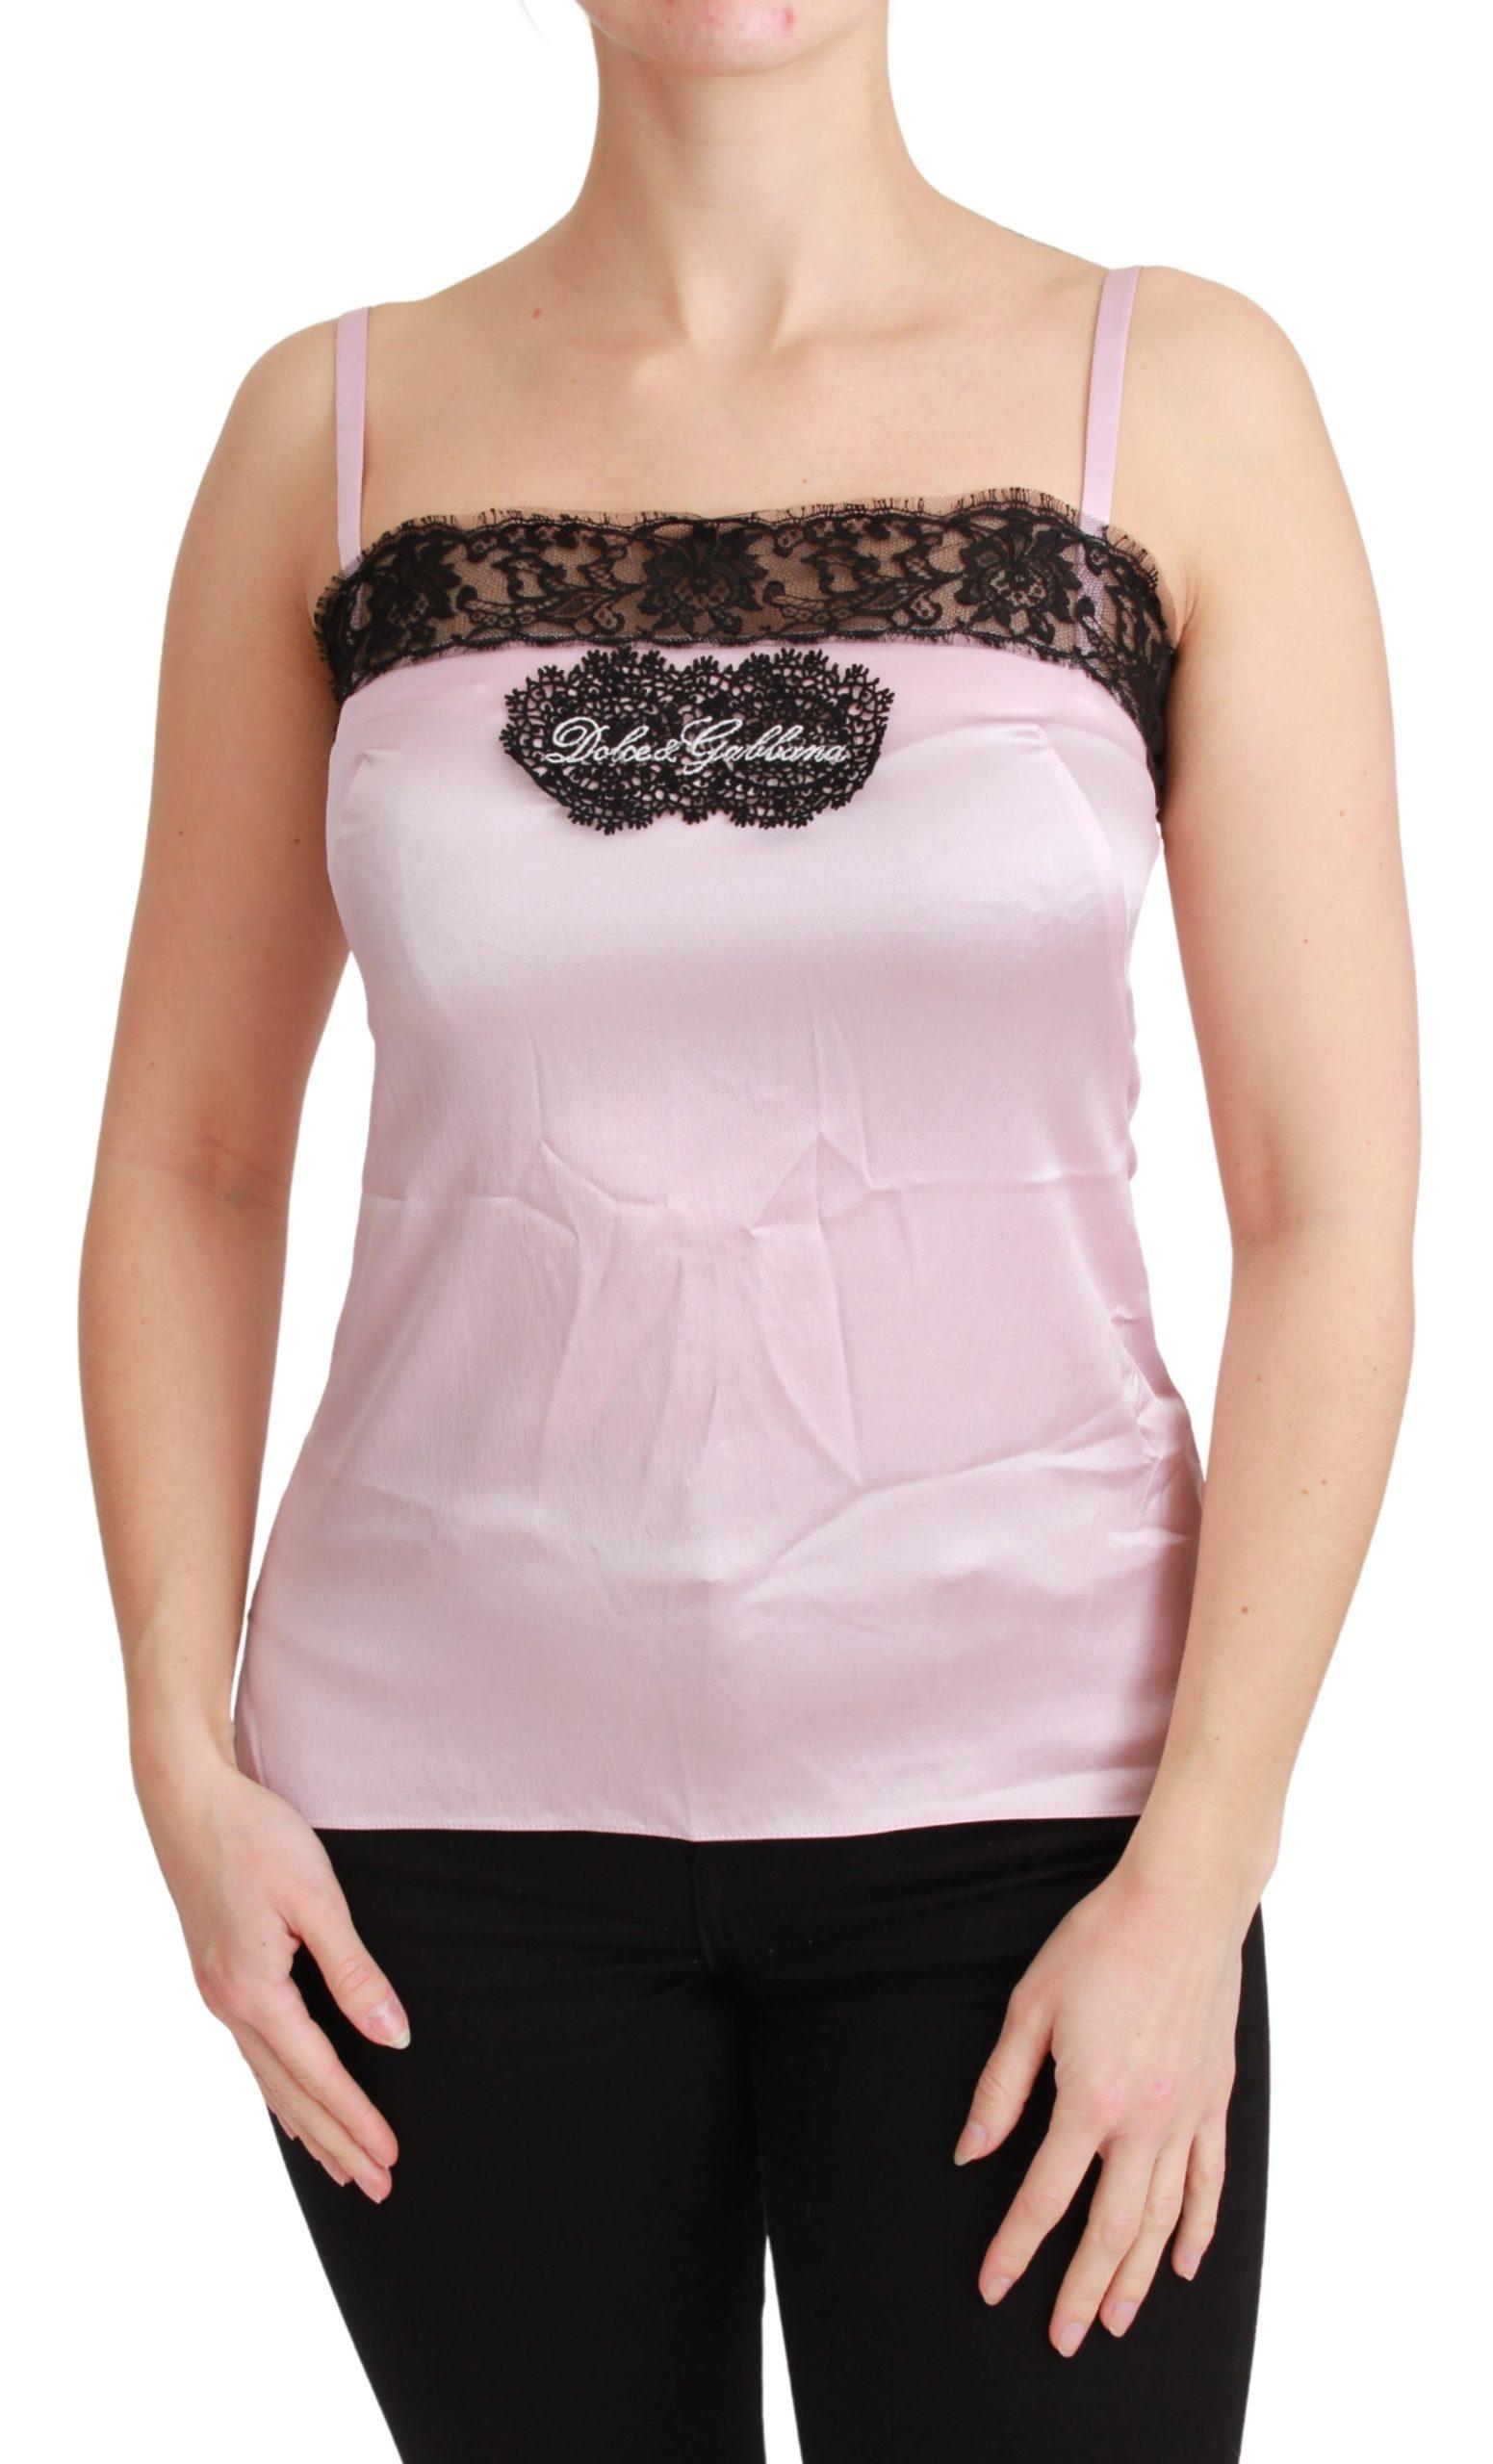 Dolce & Gabbana Women's Silk Lace Top Silver TSH4591 - IT38|XS